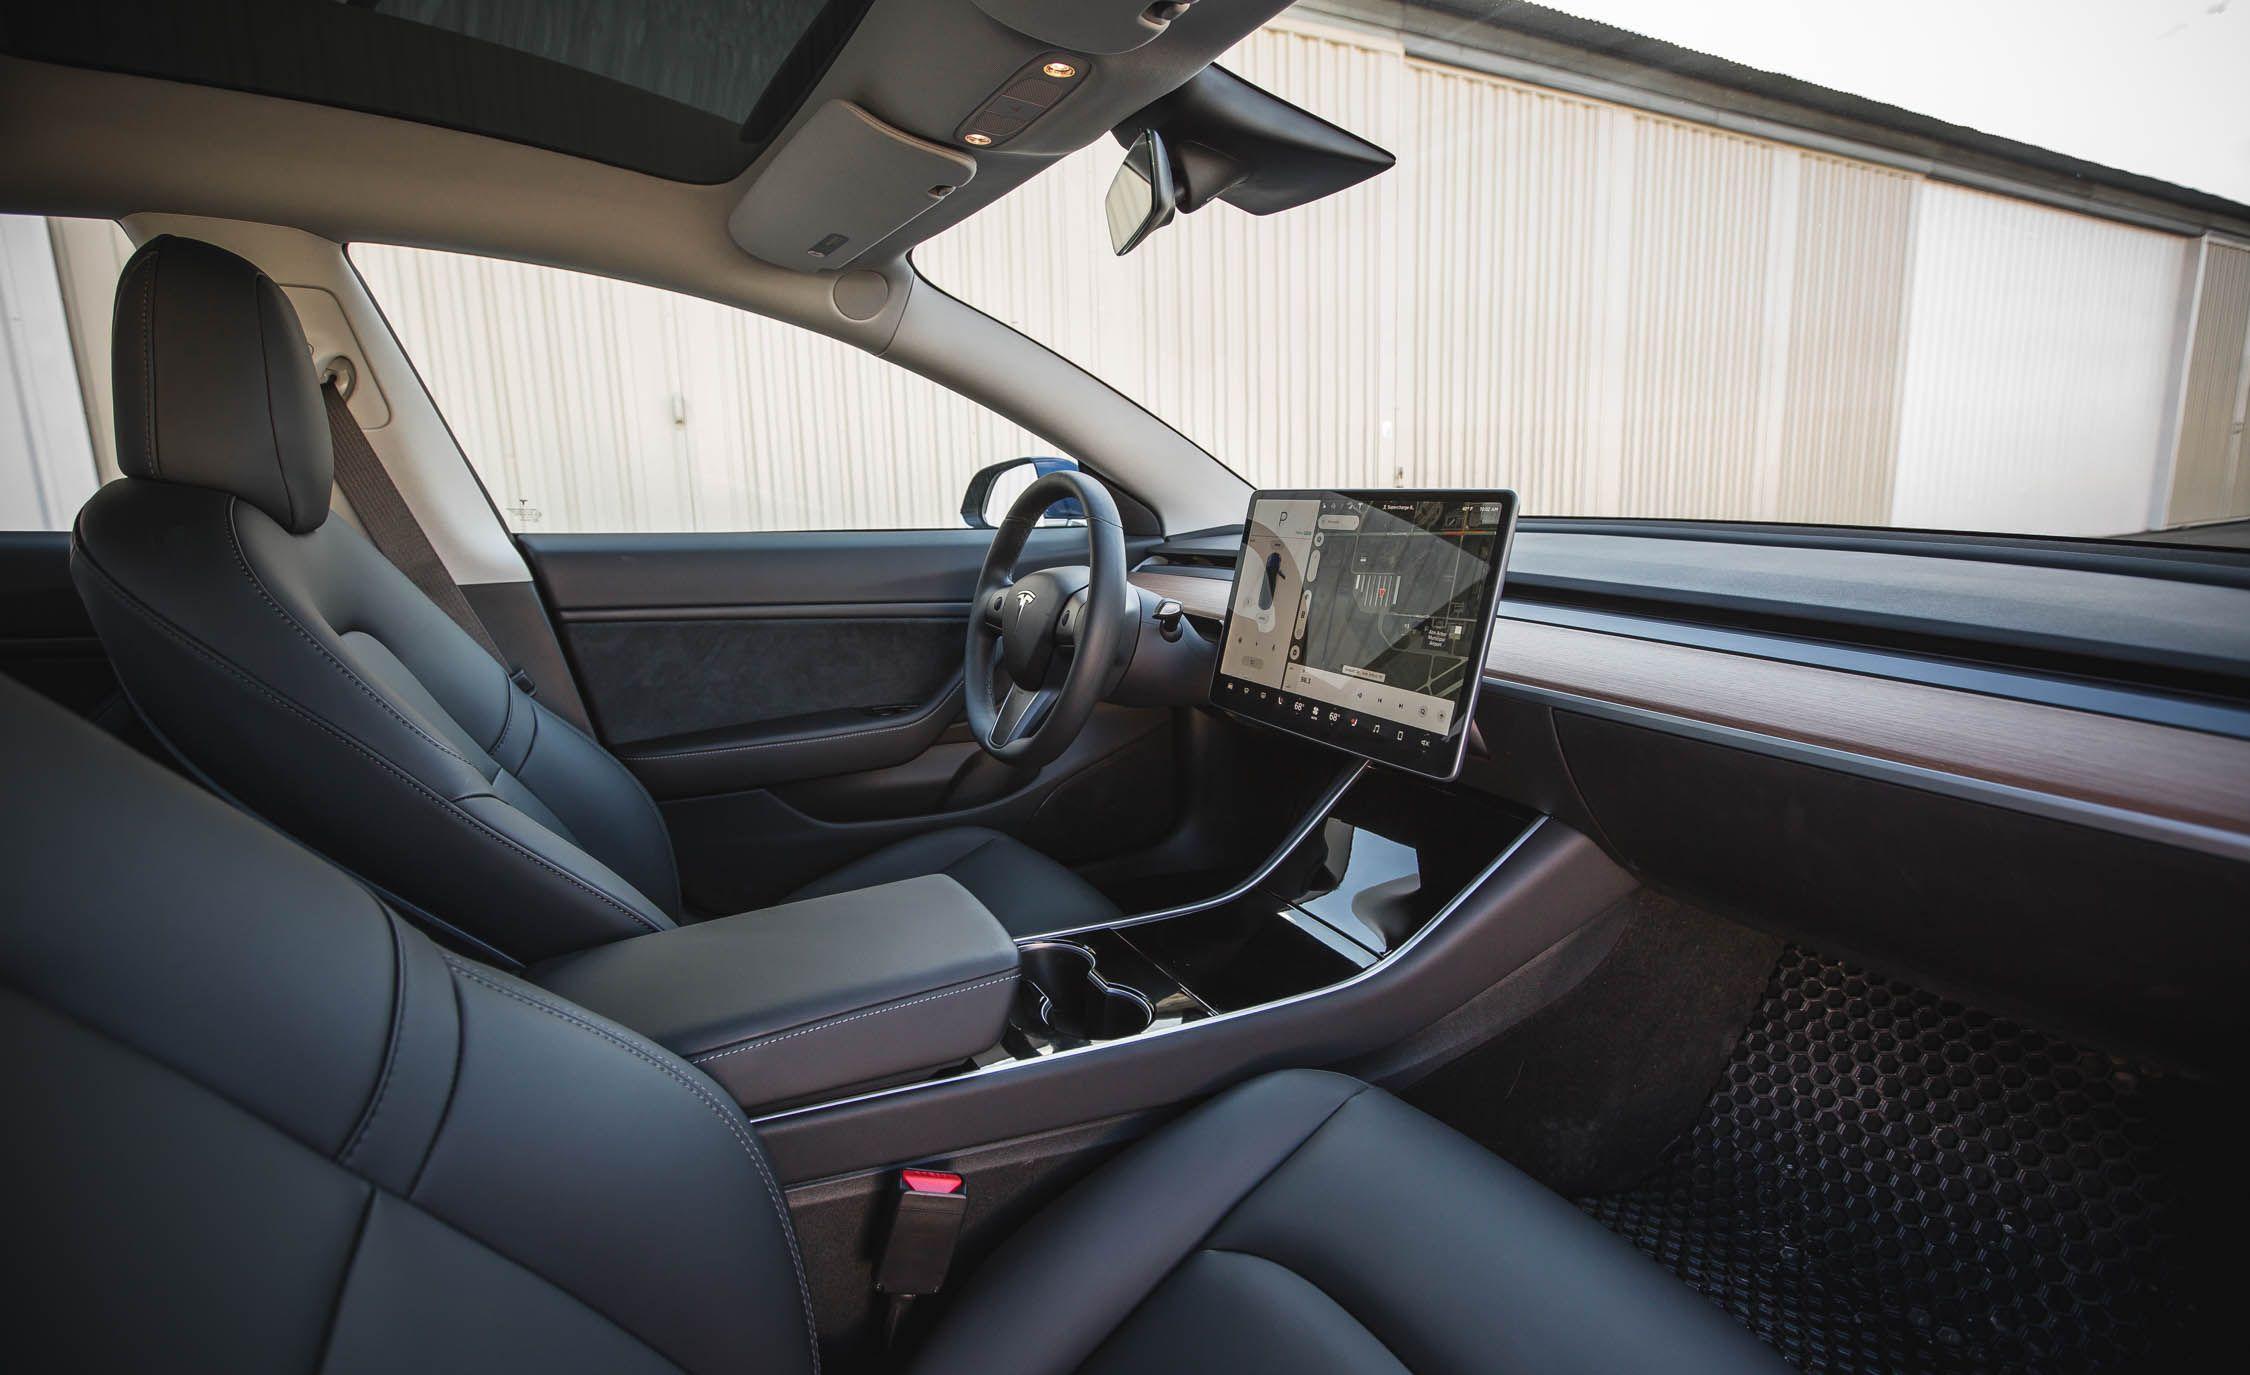 2018 tesla model 3 interior and passenger space review car and driver. Black Bedroom Furniture Sets. Home Design Ideas